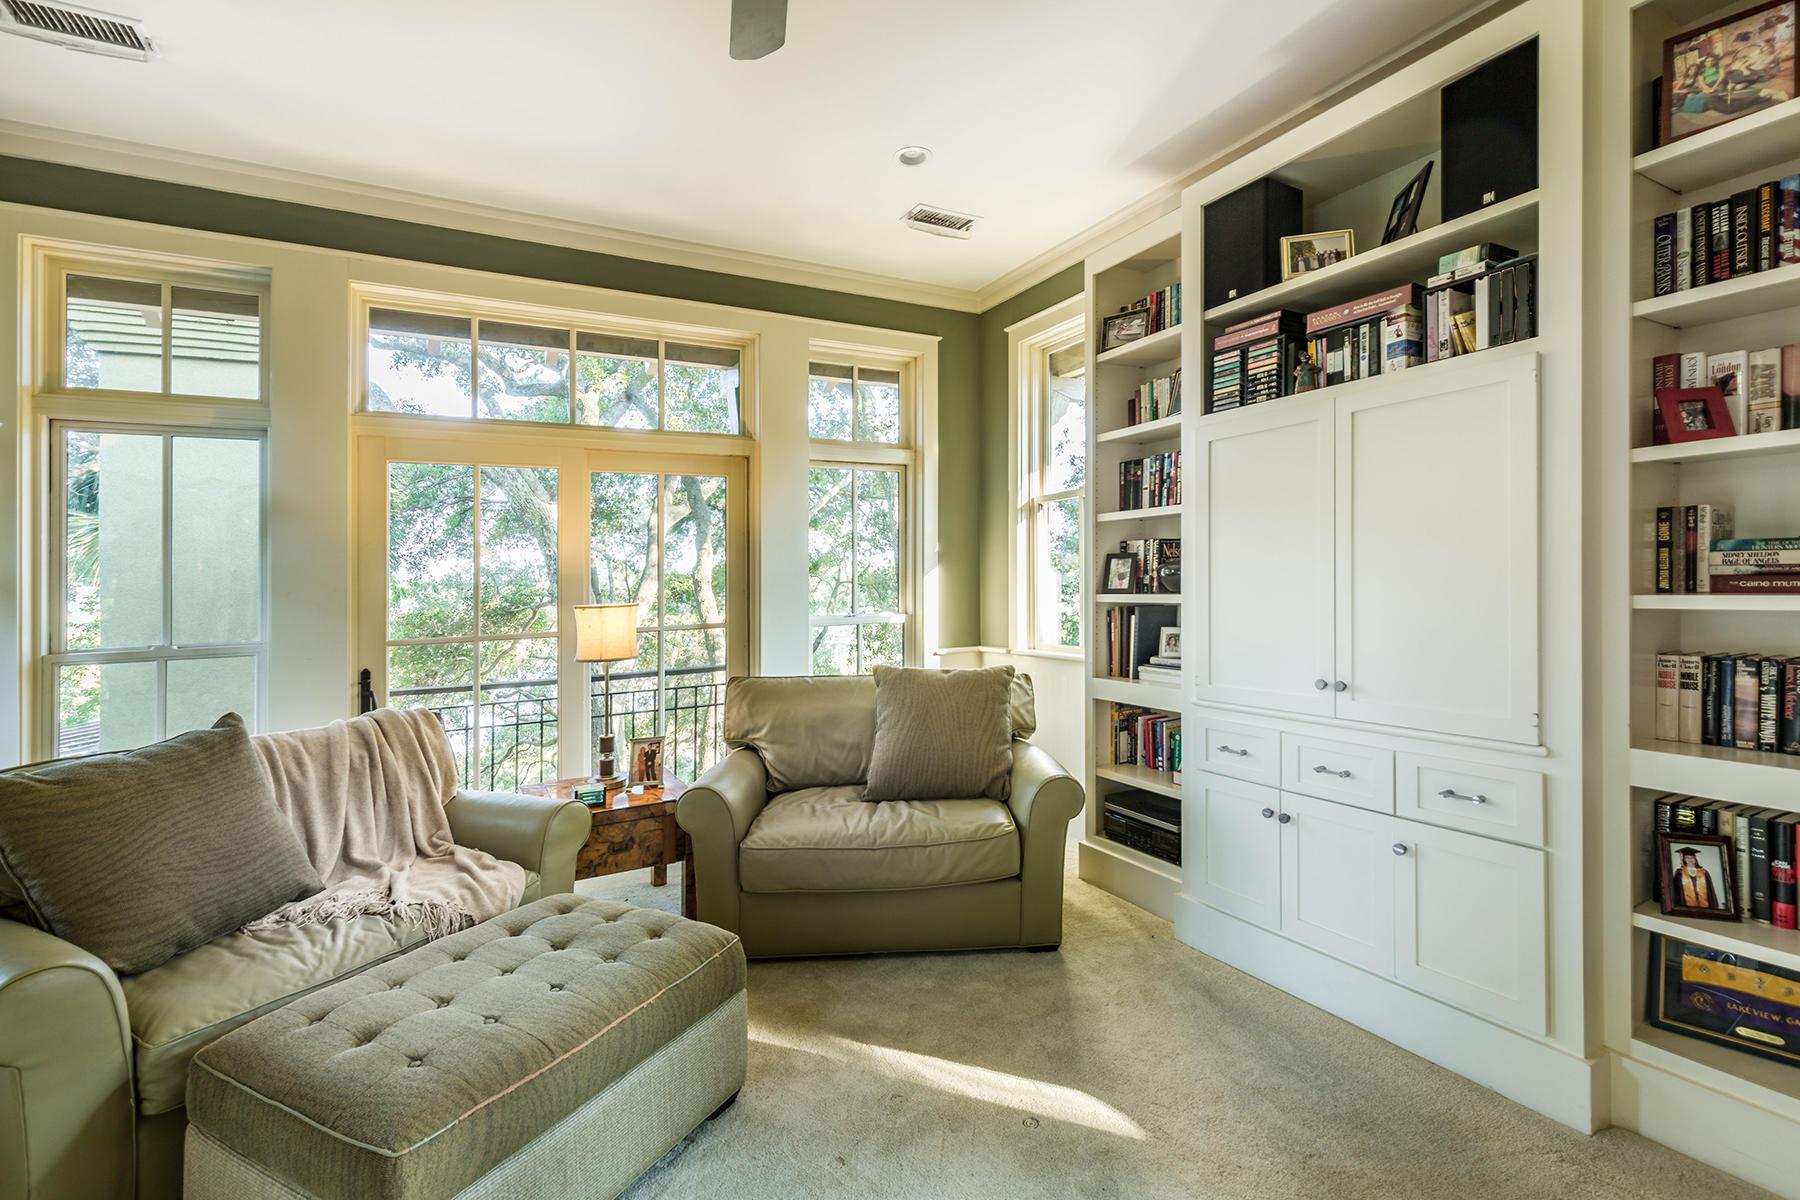 Ellis Oaks Homes For Sale - 672 Ellis Oak, Charleston, SC - 33